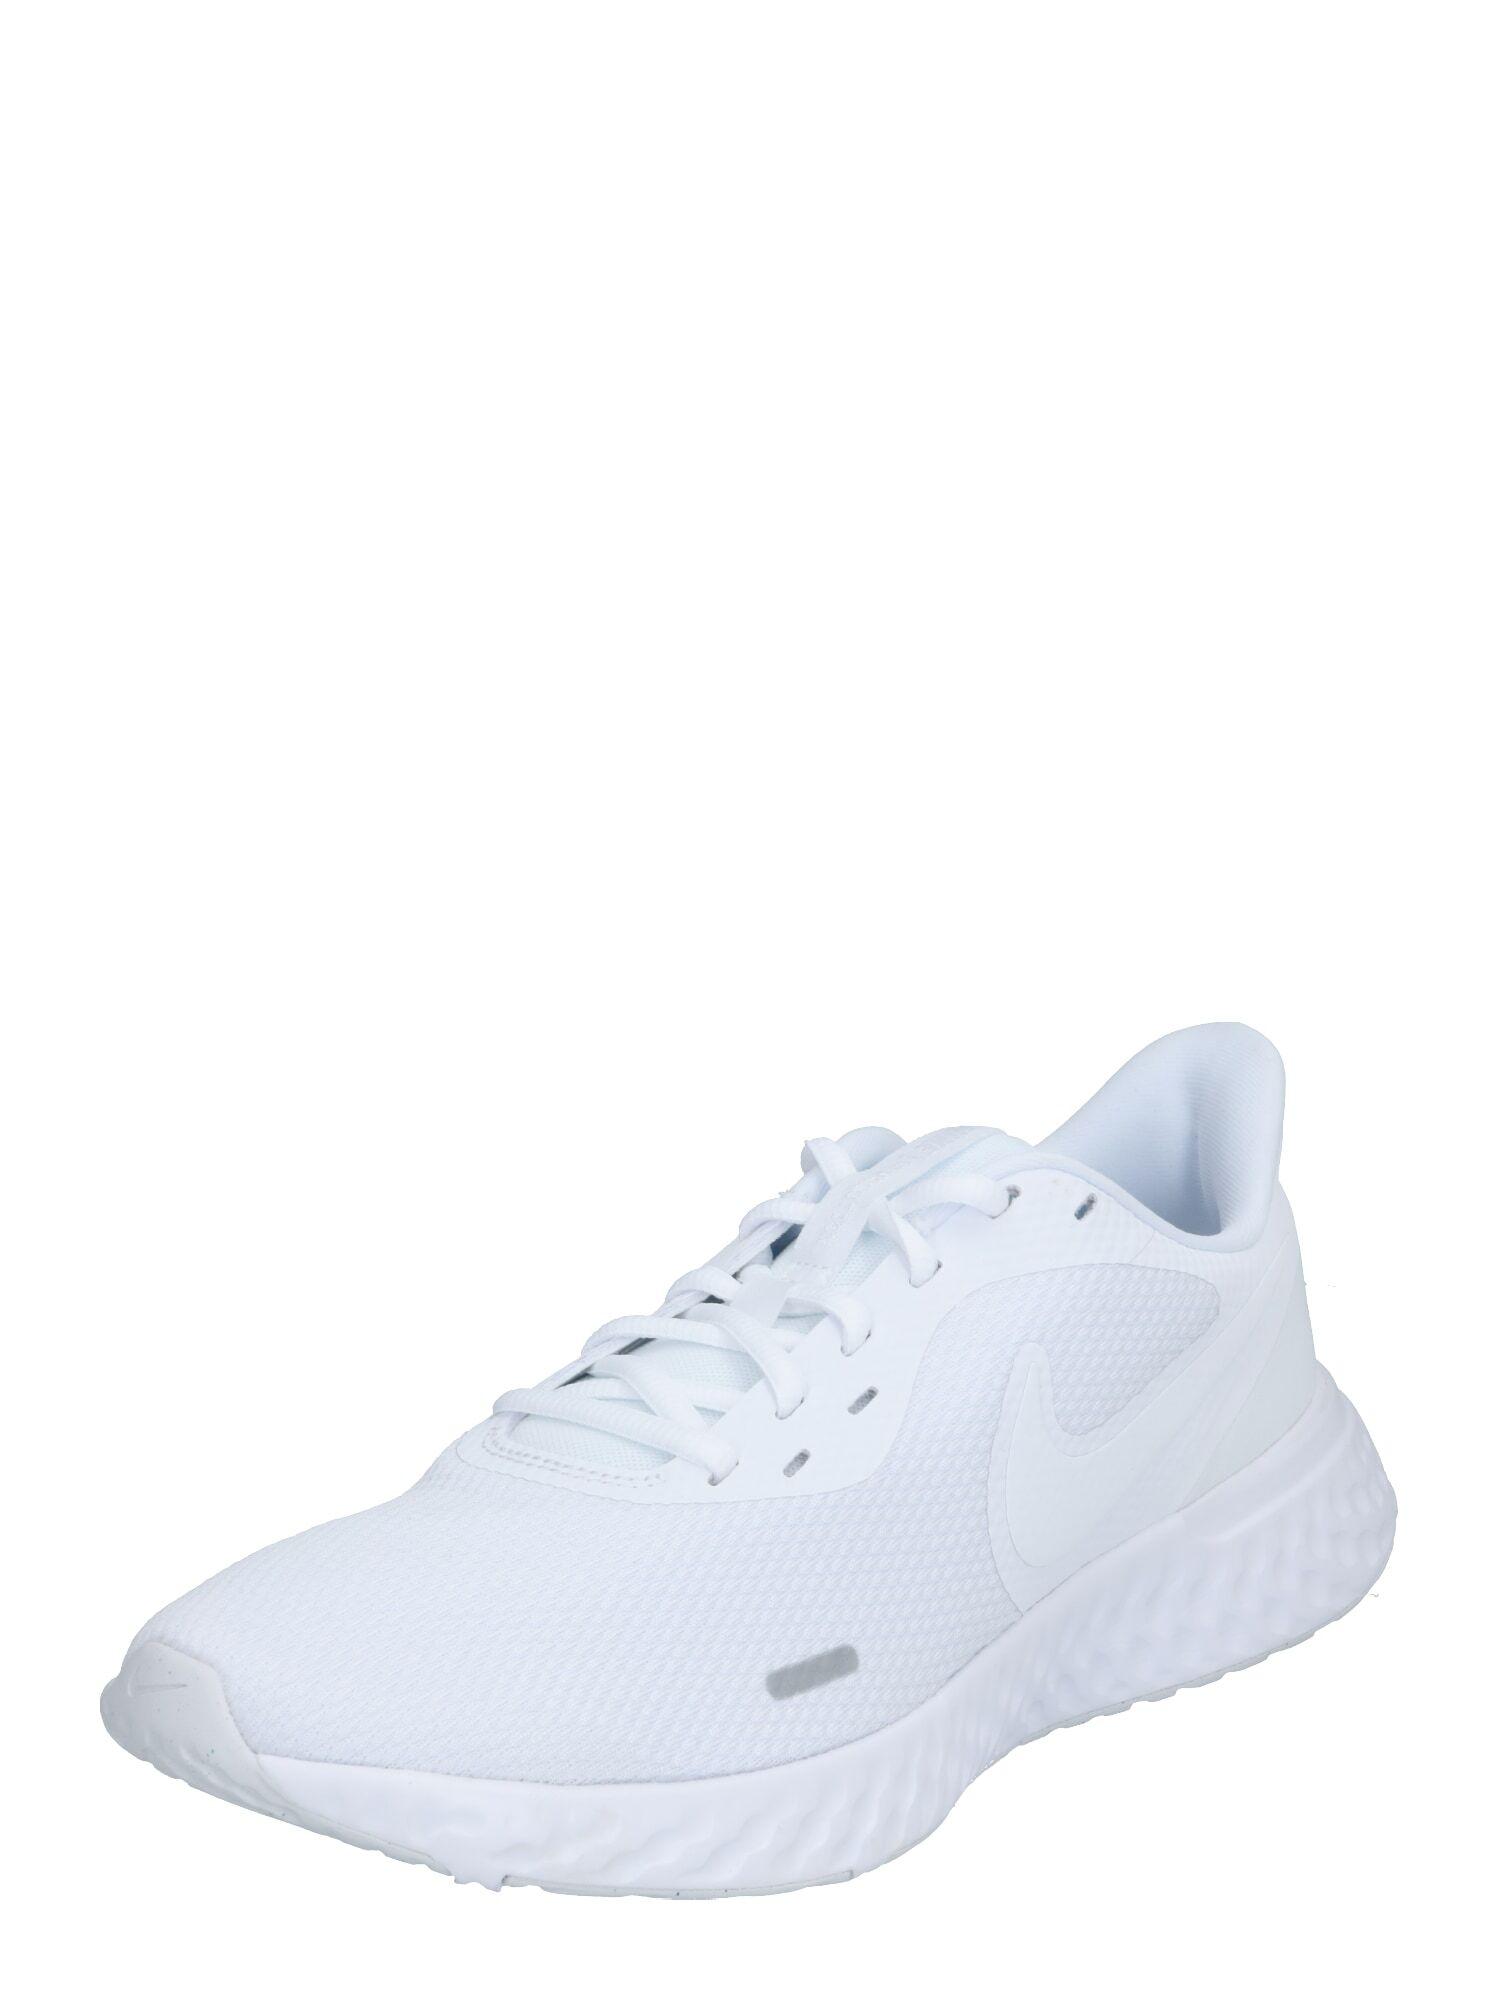 NIKE Chaussure de course 'Revolution 5'  - Blanc - Taille: 10 - female